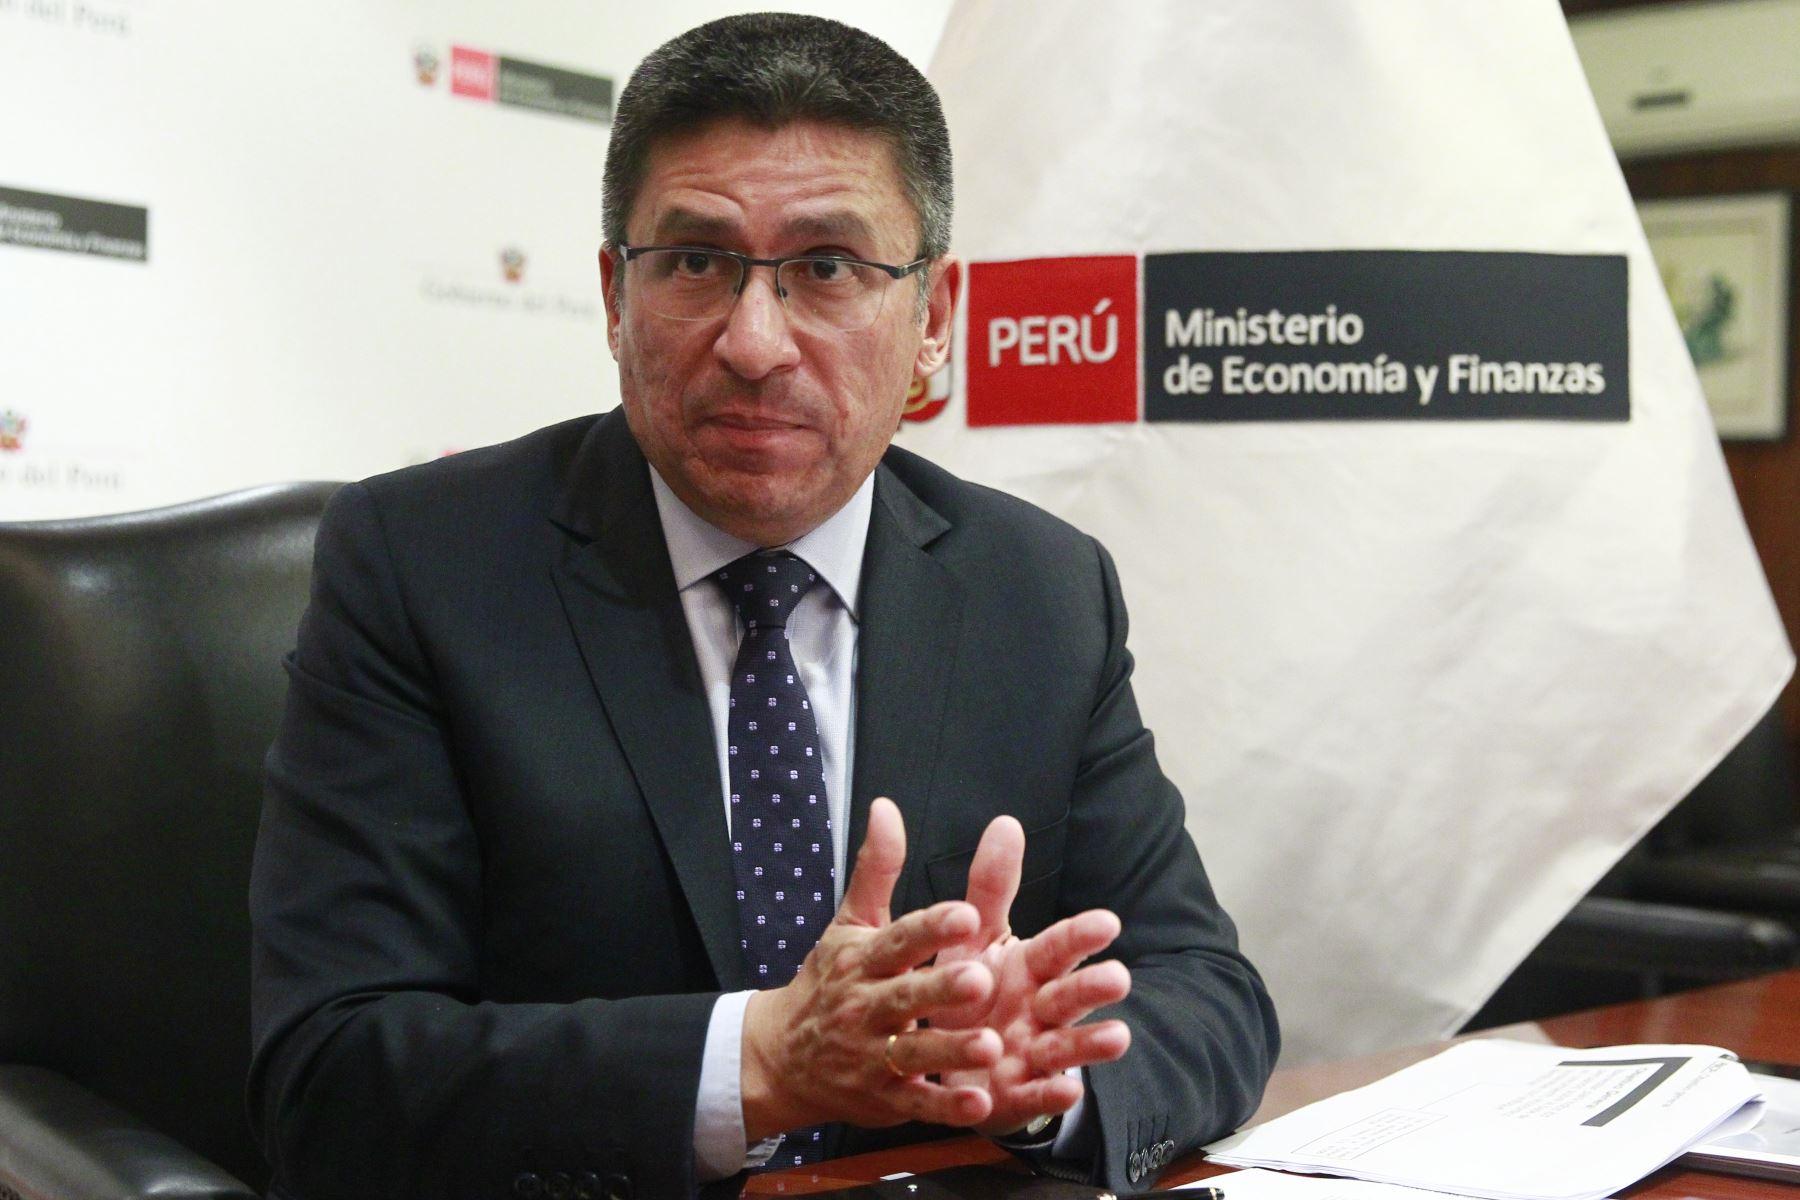 Viceministro de Economía, Hugo Perea. ANDINA/Eddy Ramos